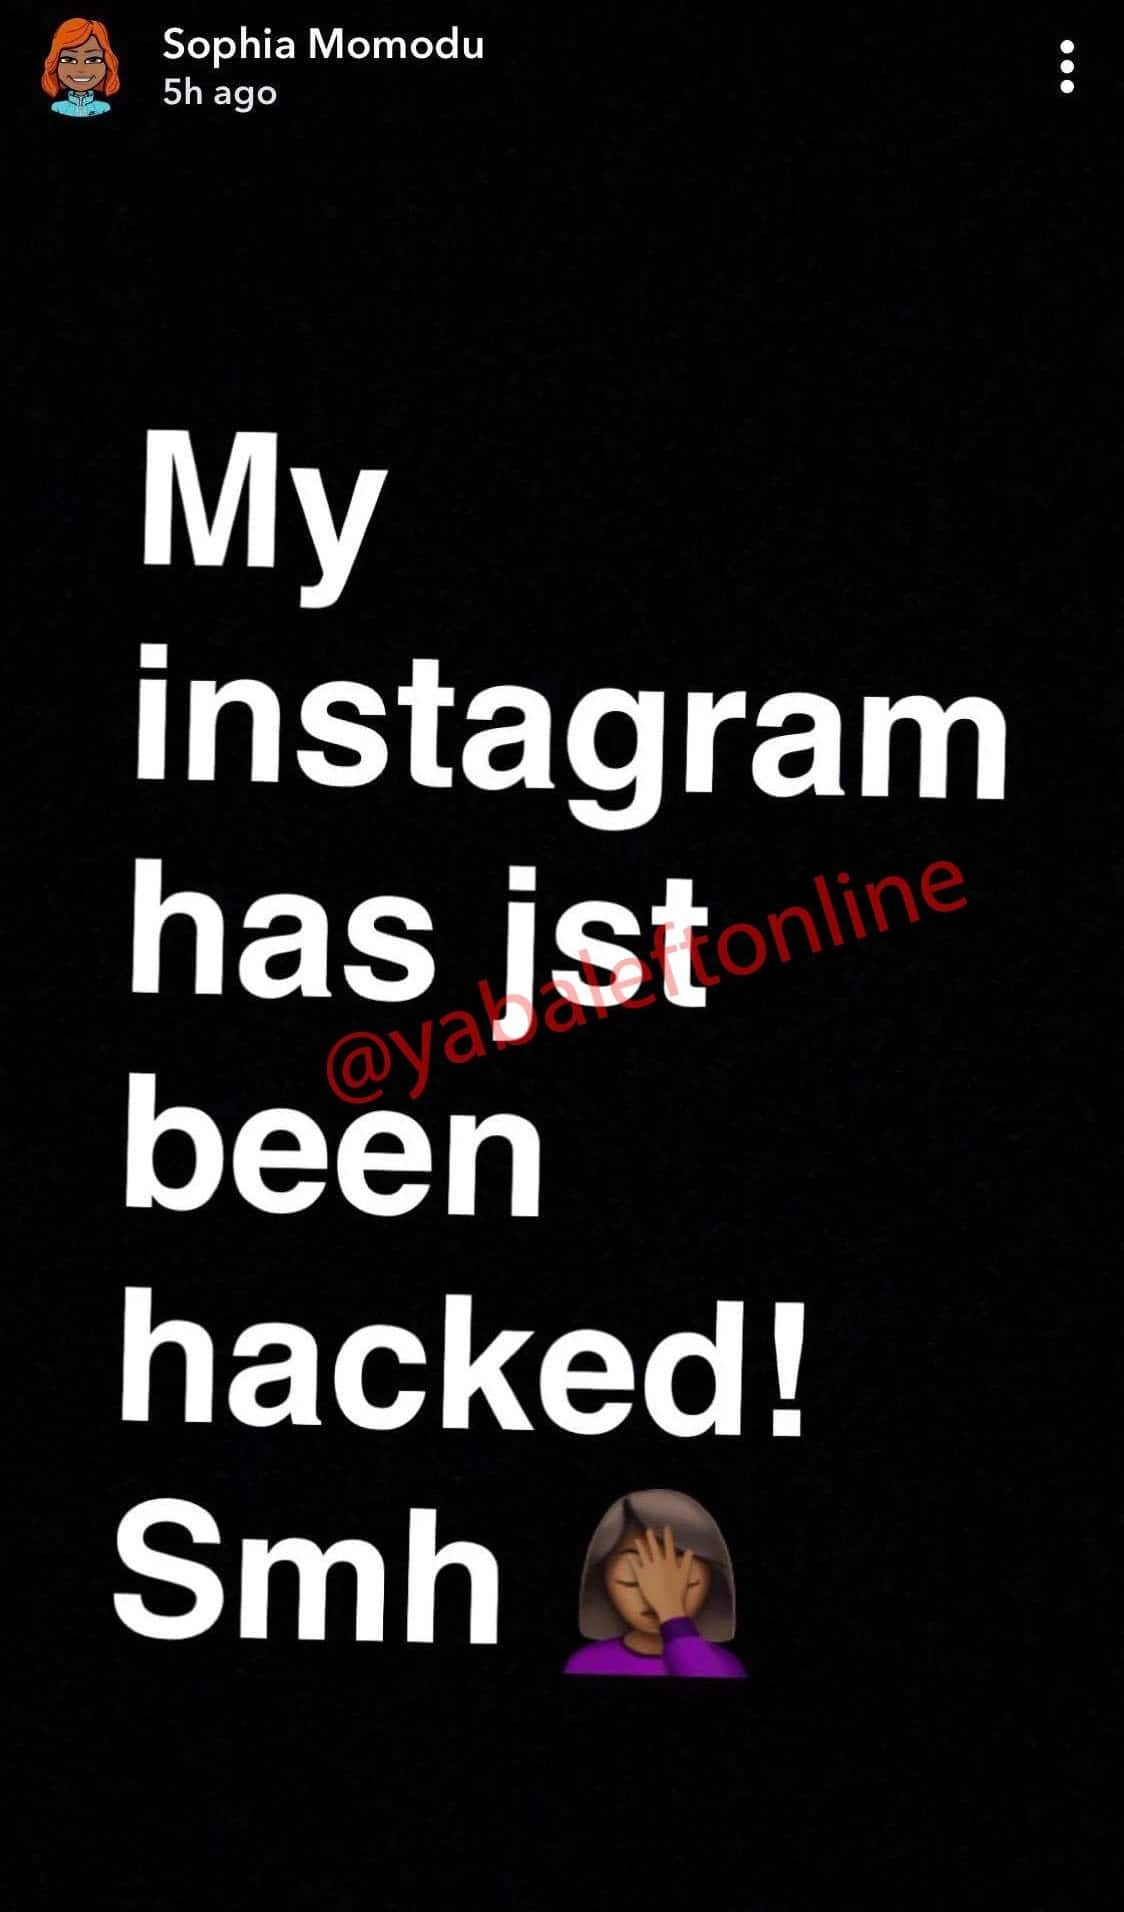 Davido's baby-mama Sophia Momodu denies deactivating her Instagram over Davido's girlfriend Chioma